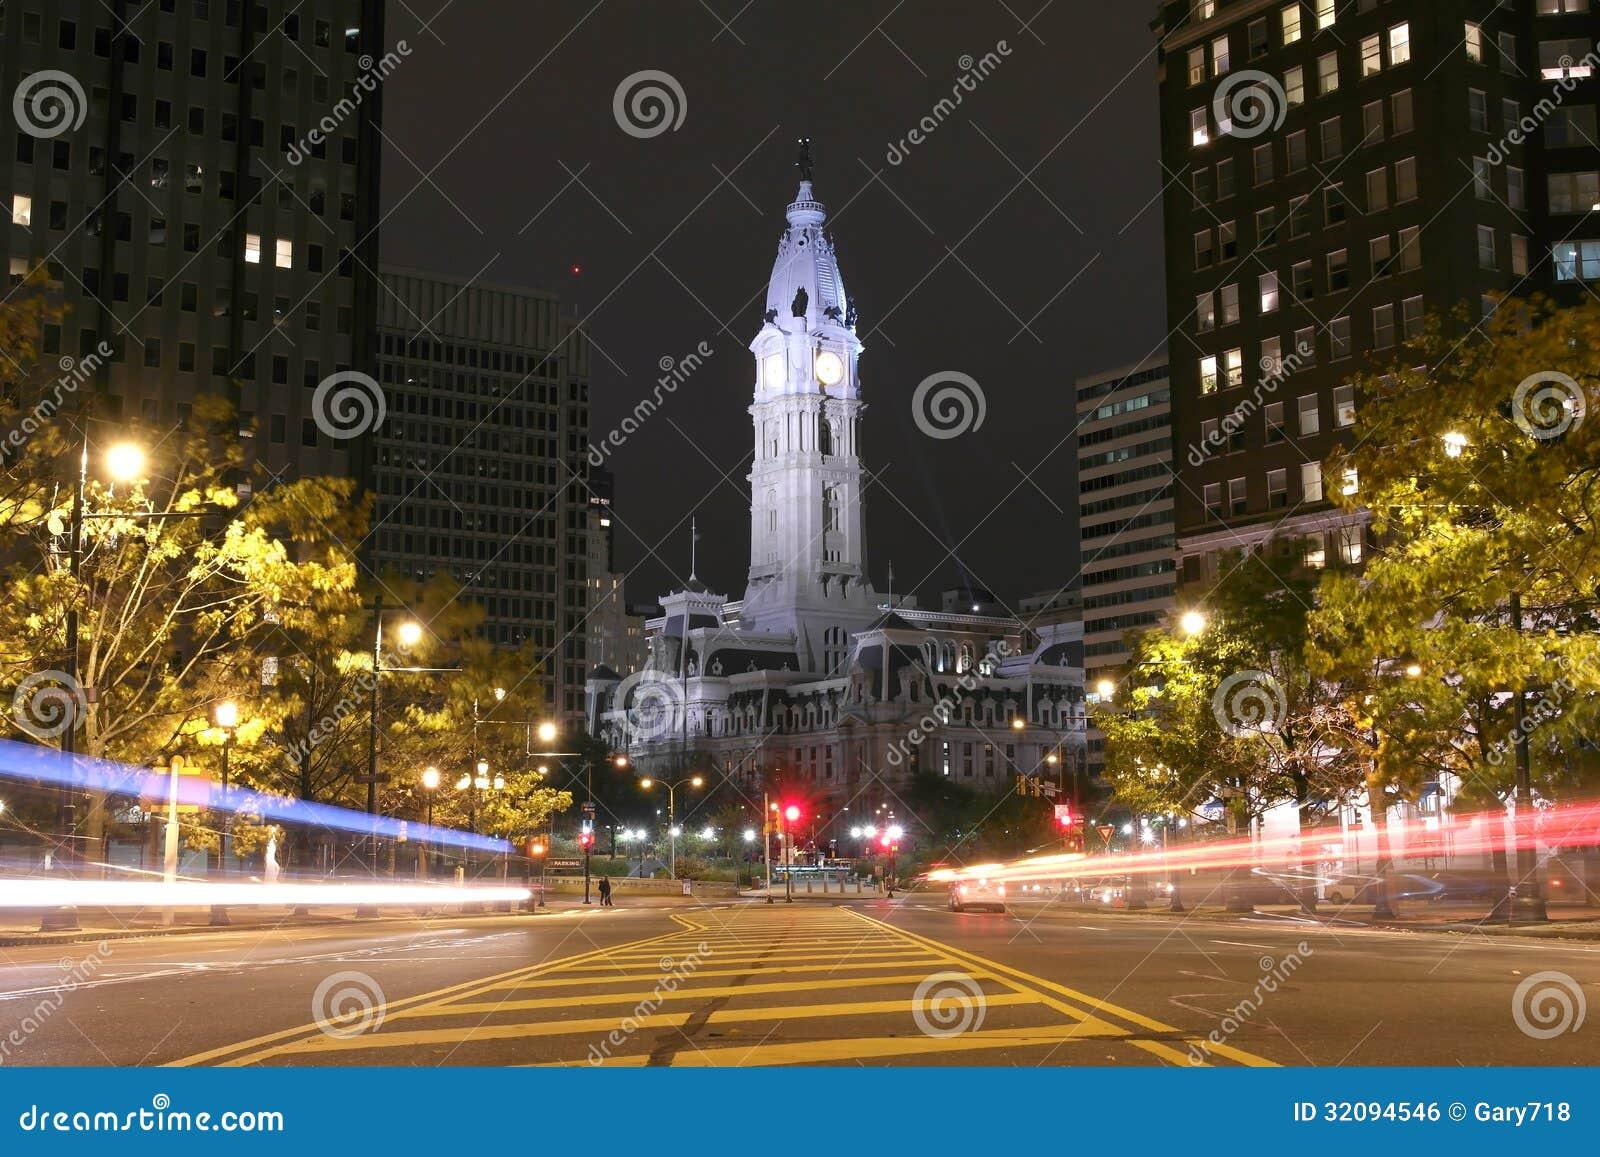 The Philadelphia City Hall building at night